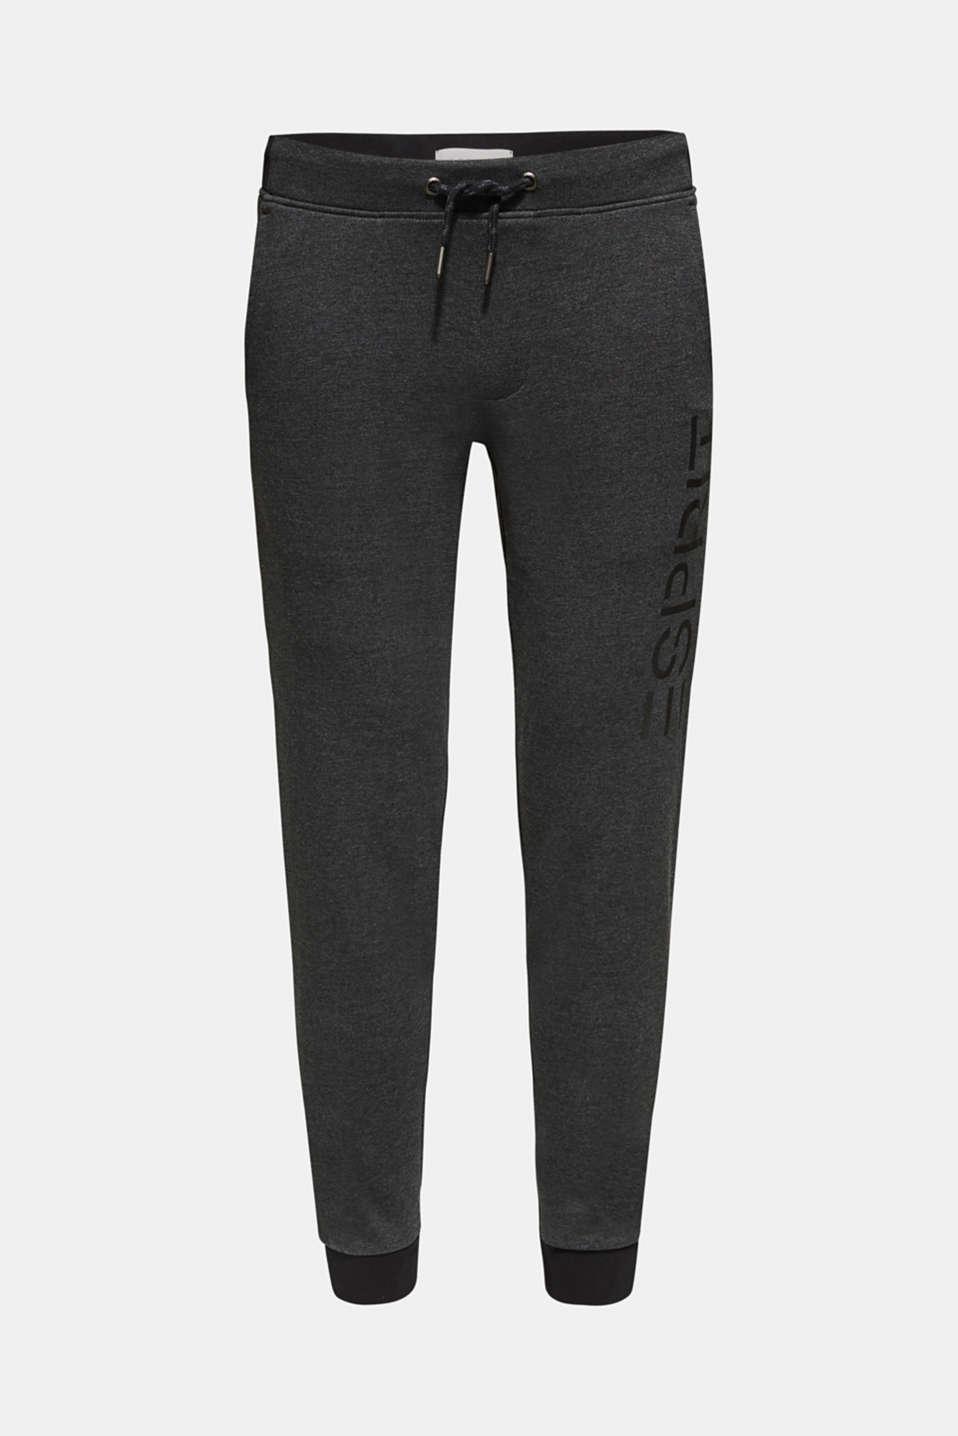 Pants knitted, DARK GREY, detail image number 4